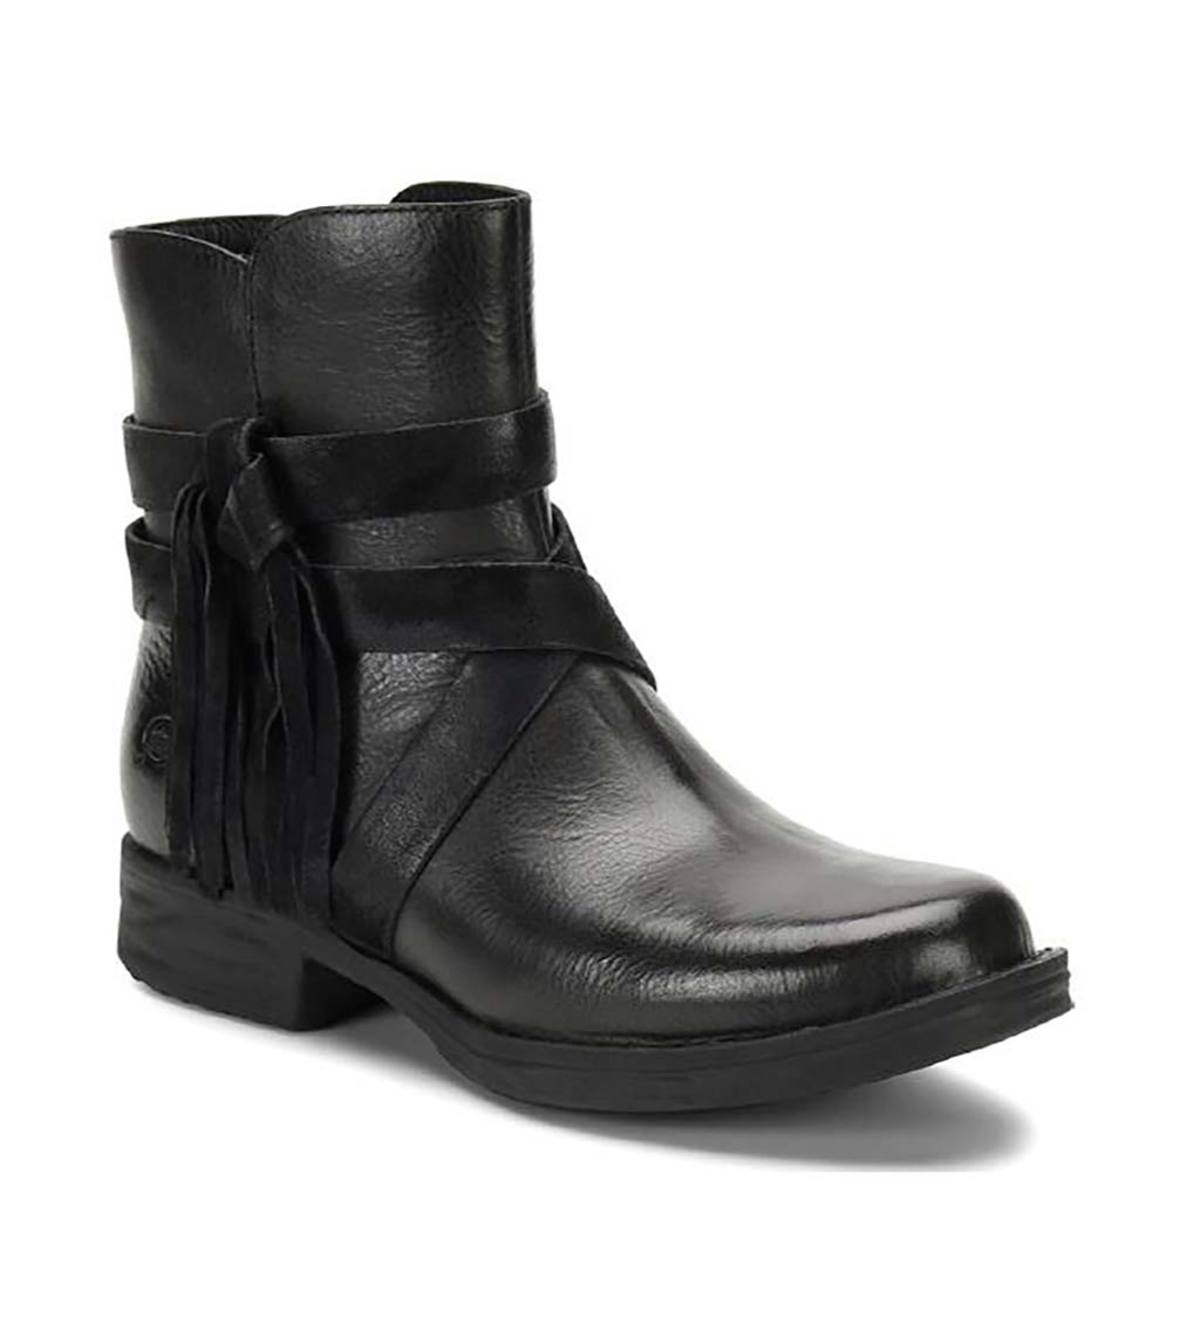 Born Perl Short Boots - Black - Size 6